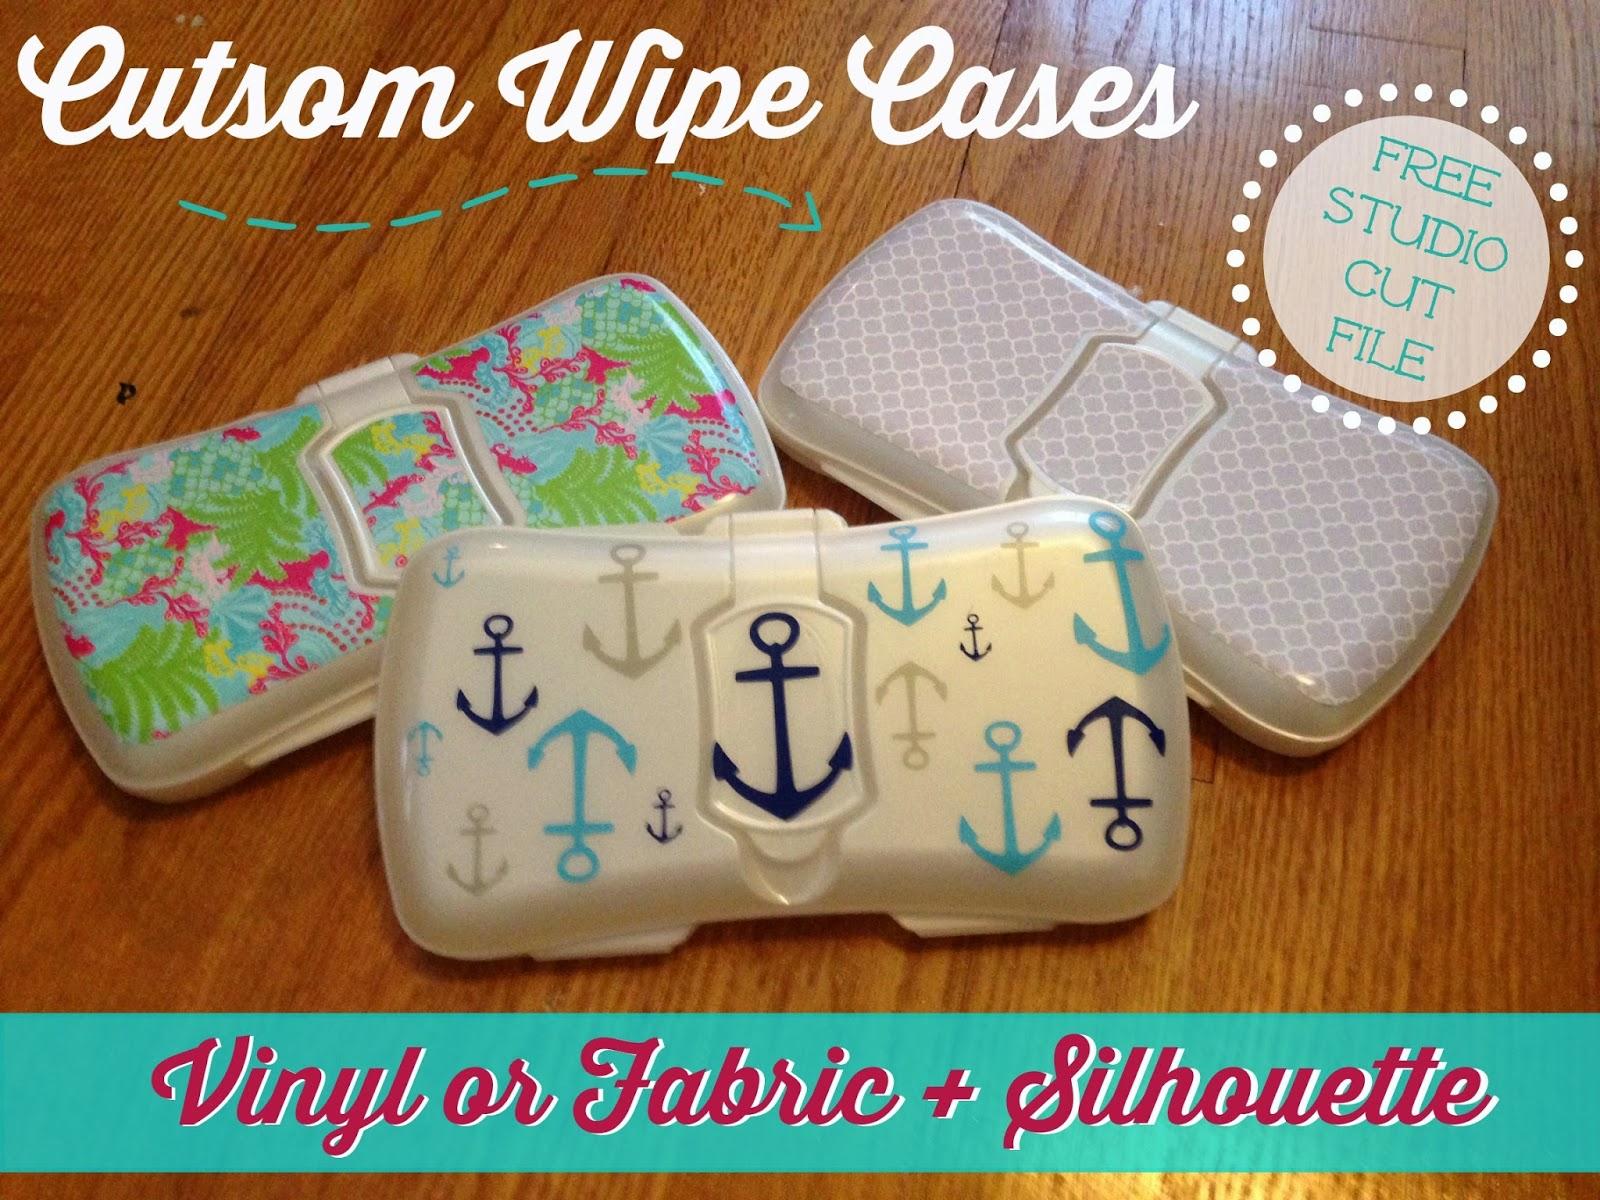 Custom, baby wipe case, Silhouette, Silhouette Studio, free cut file